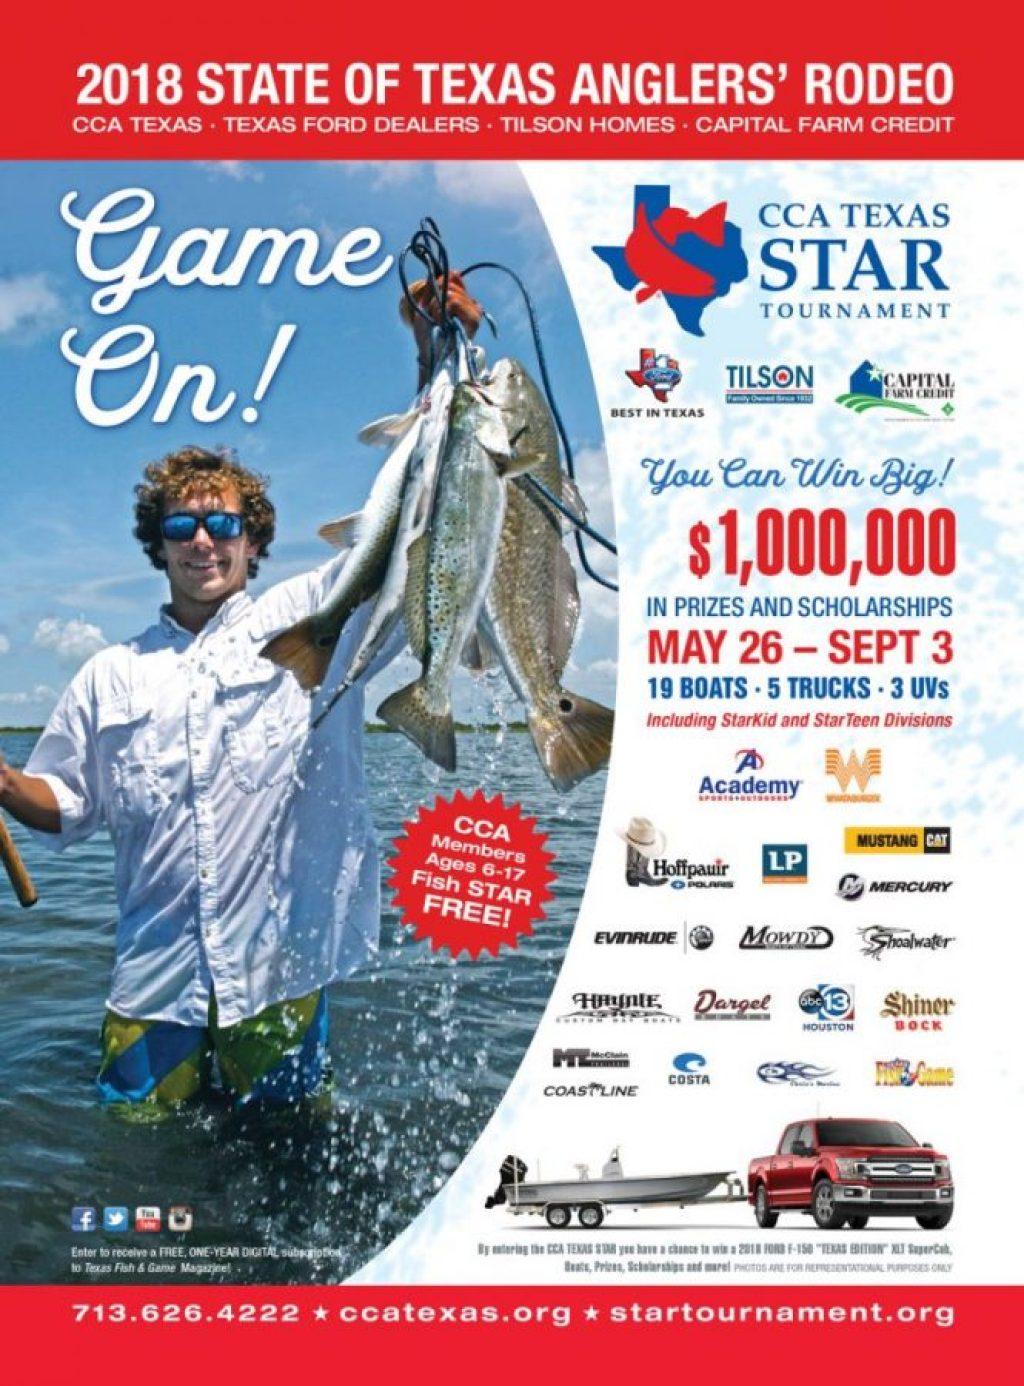 CCA Star Tournament